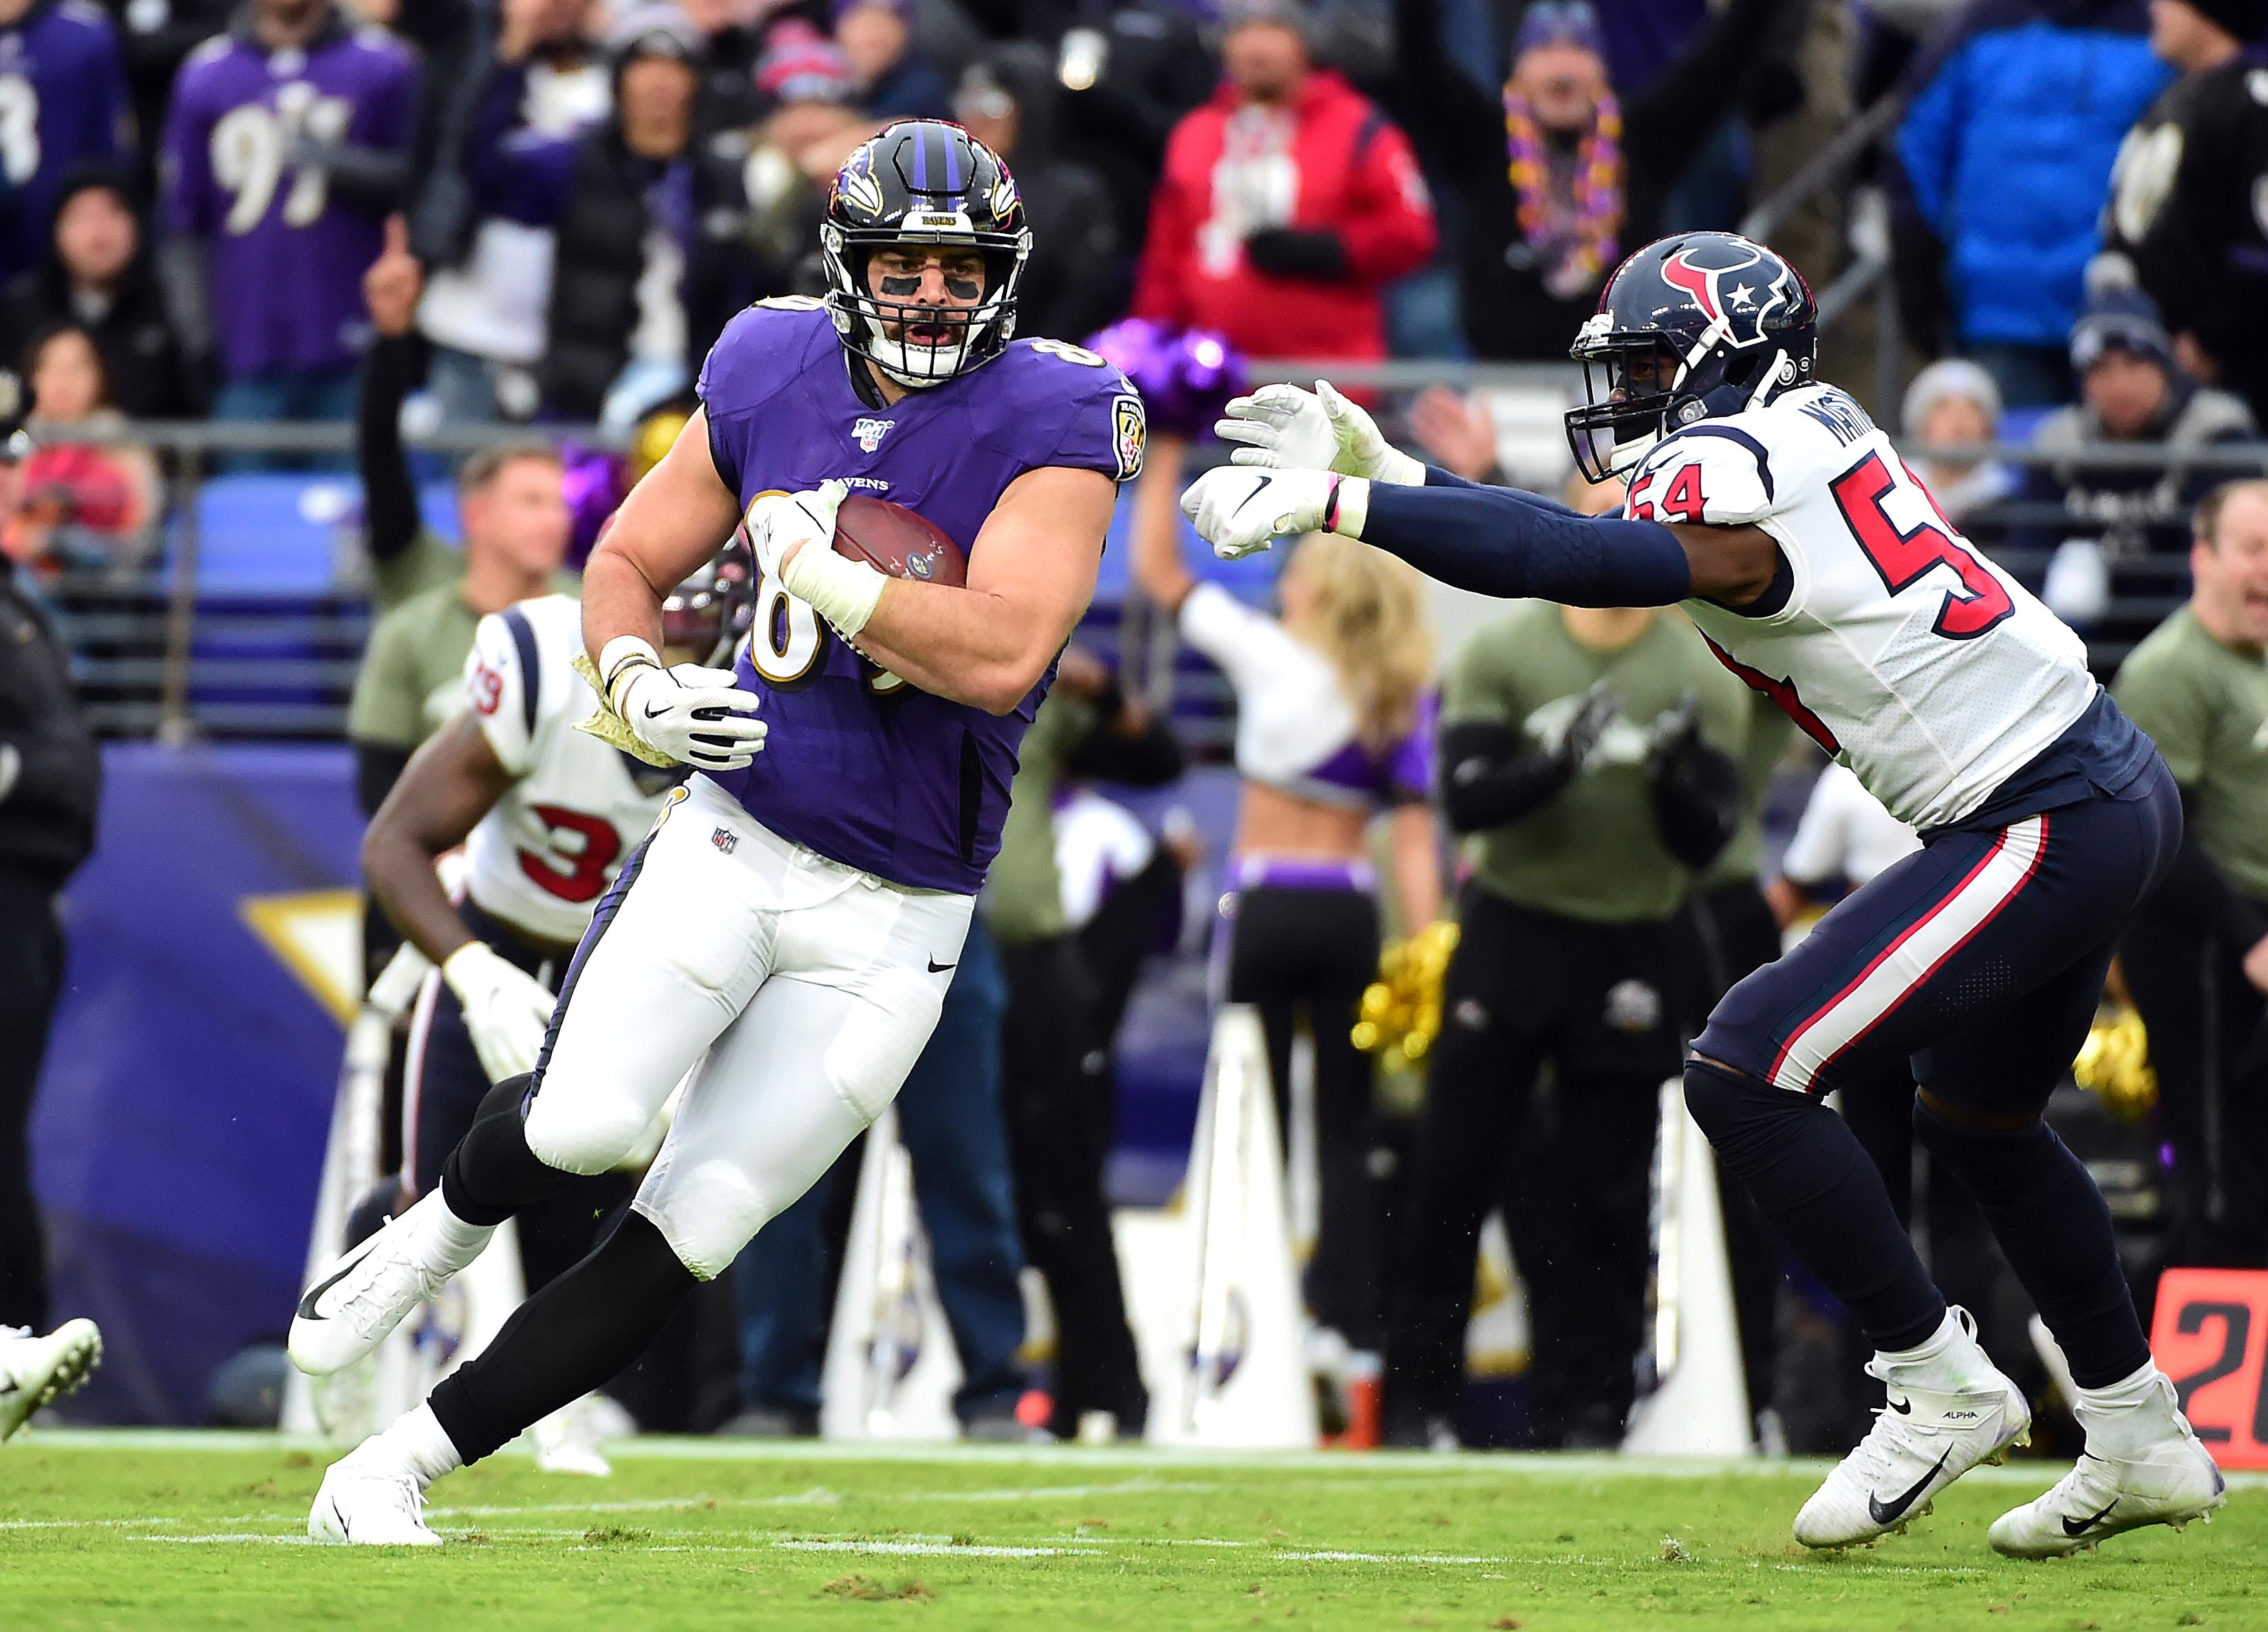 NFL: Houston Texans at Baltimore Ravens